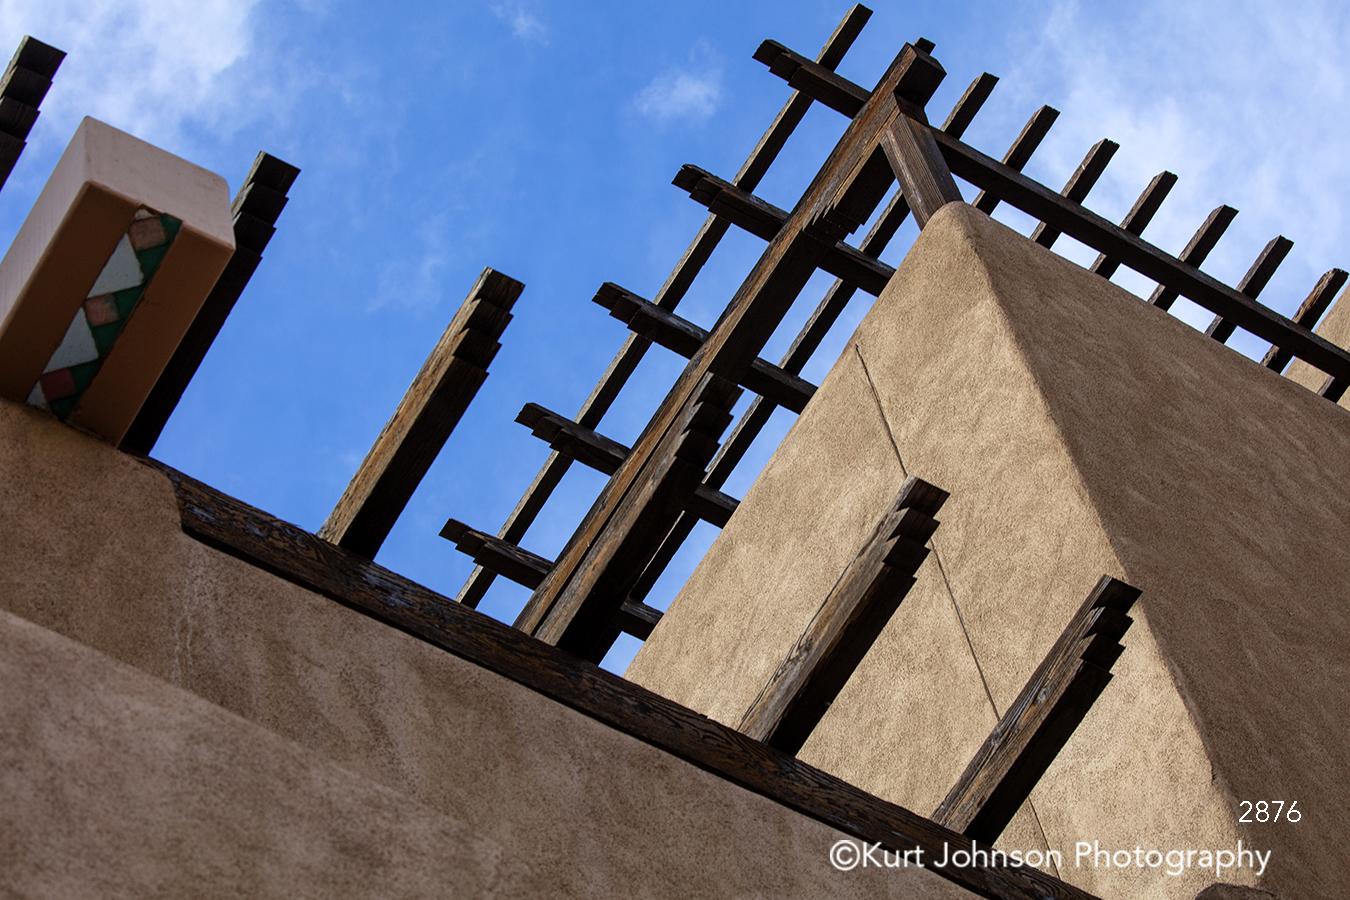 southwest desert adobe sante fe building new mexico lines brown